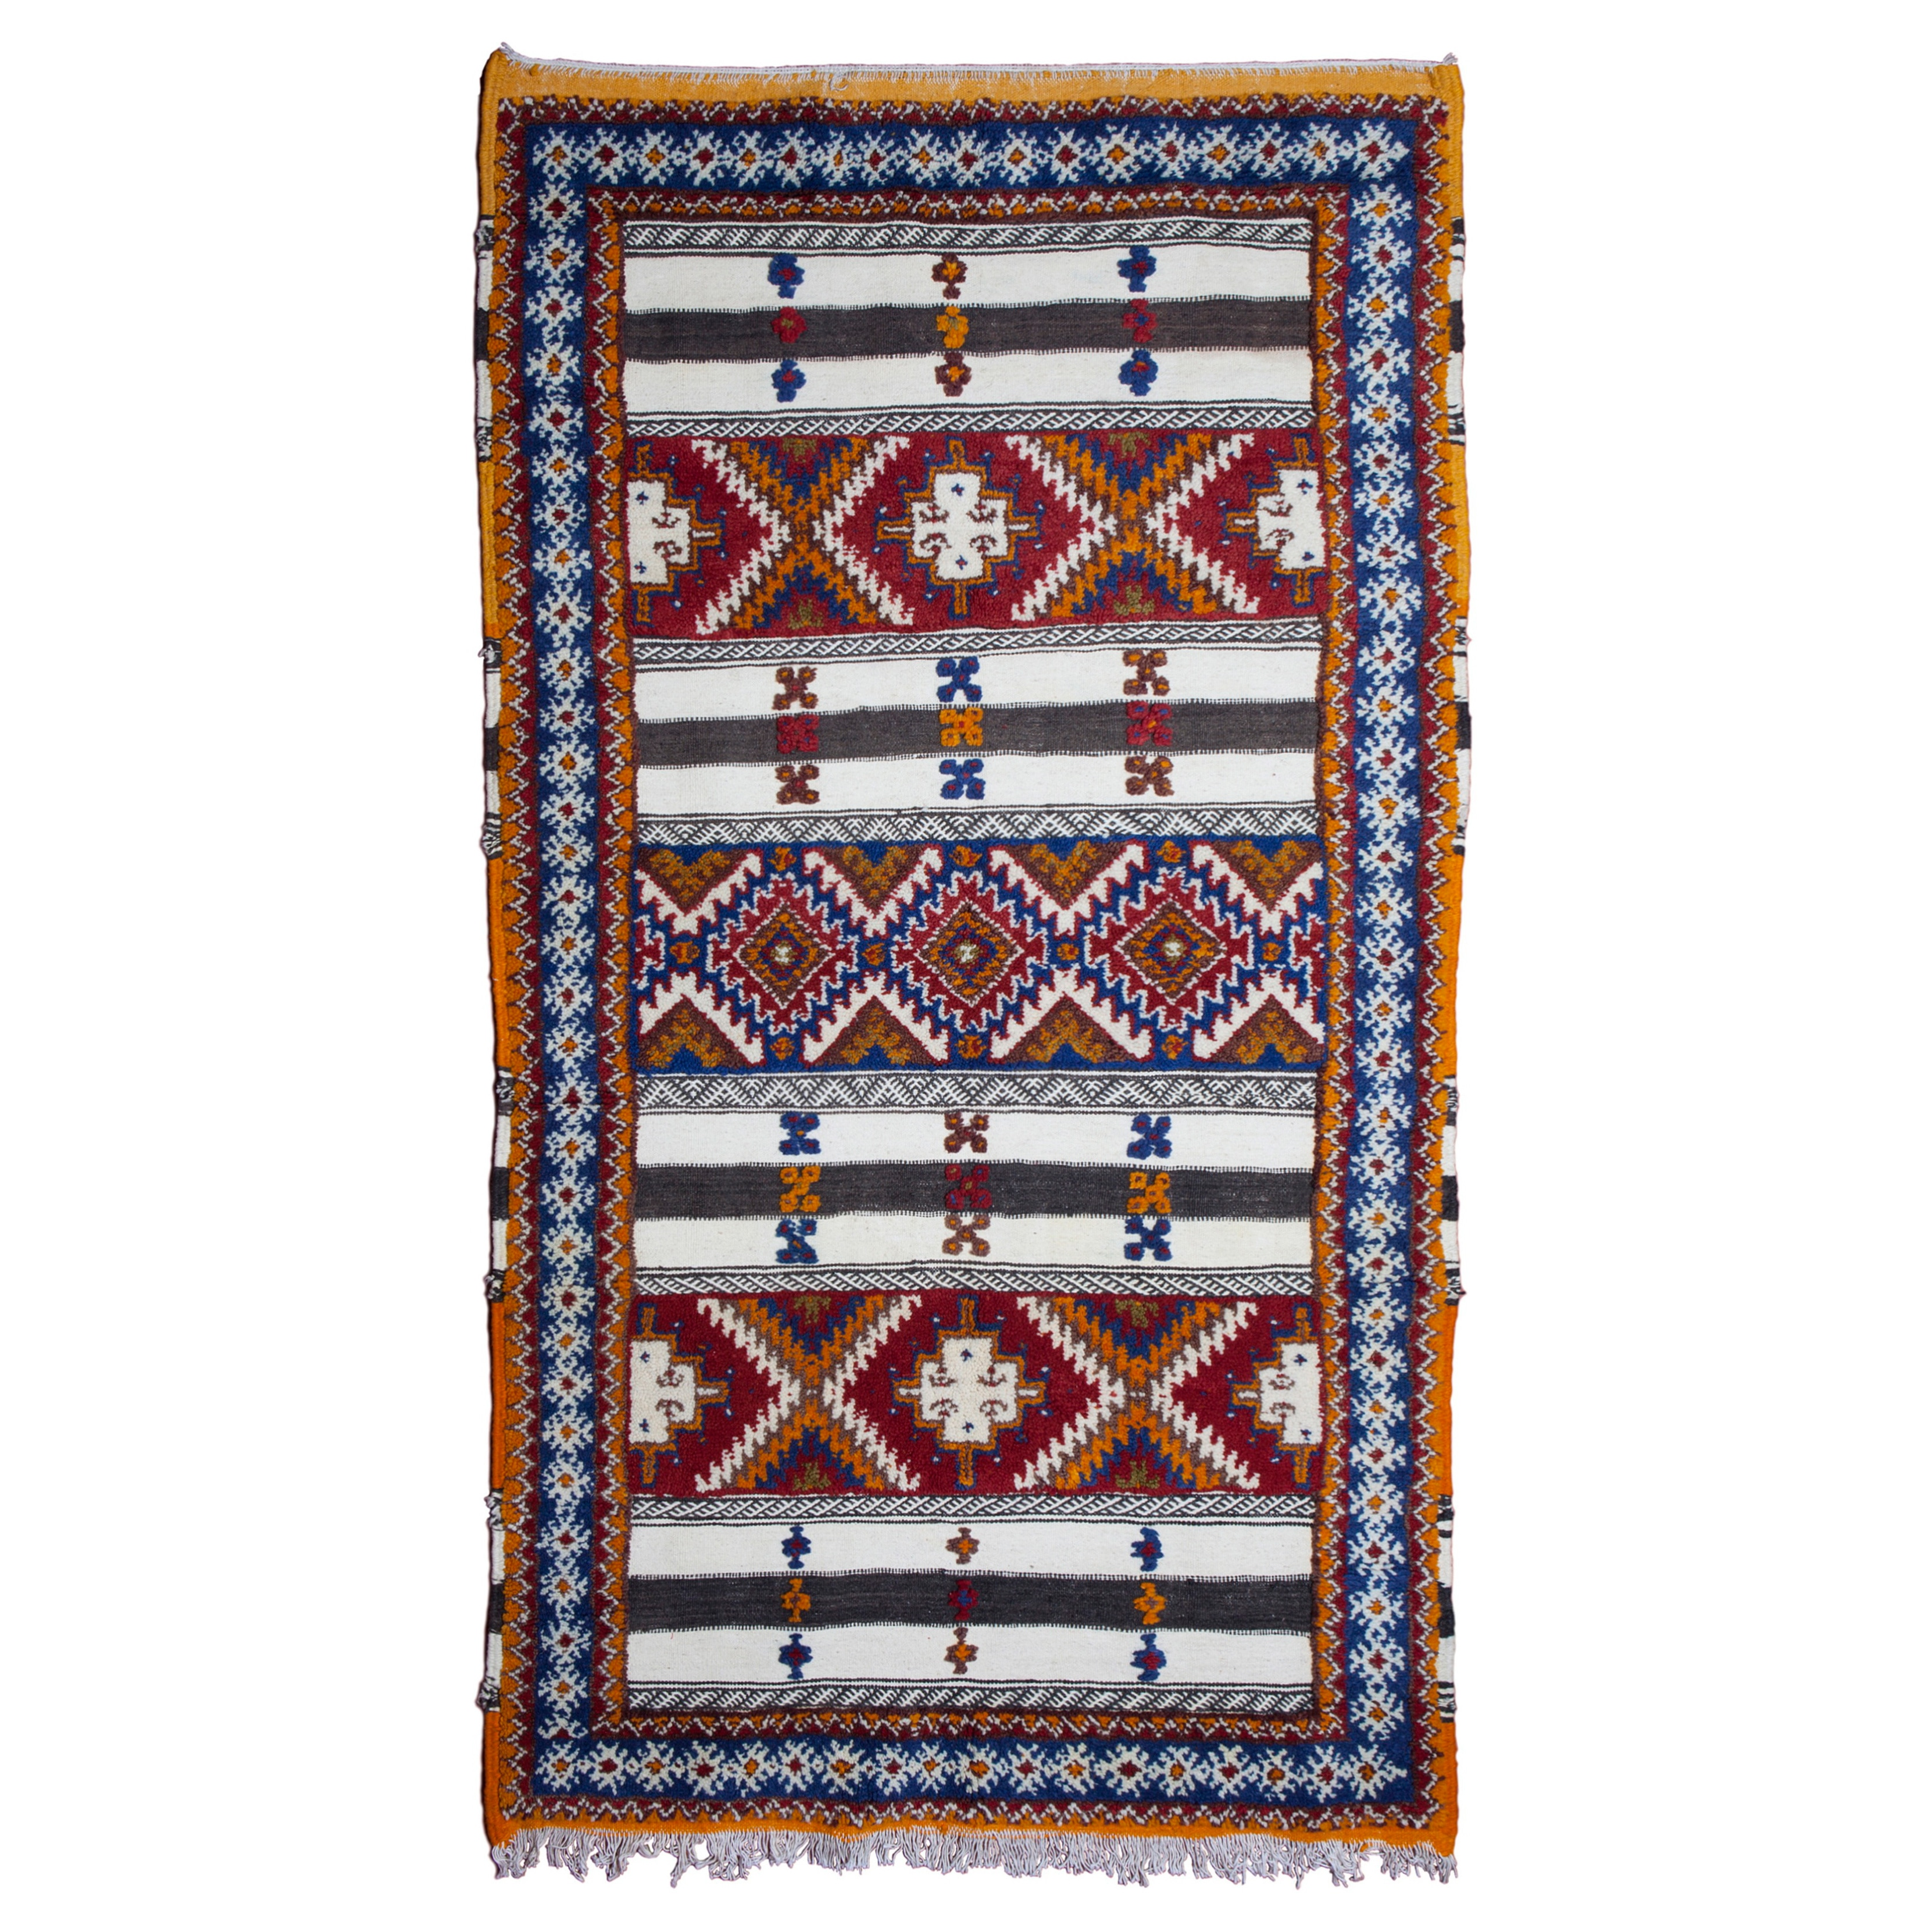 Designer and modern rug Morocco Moroccan pattern Multi